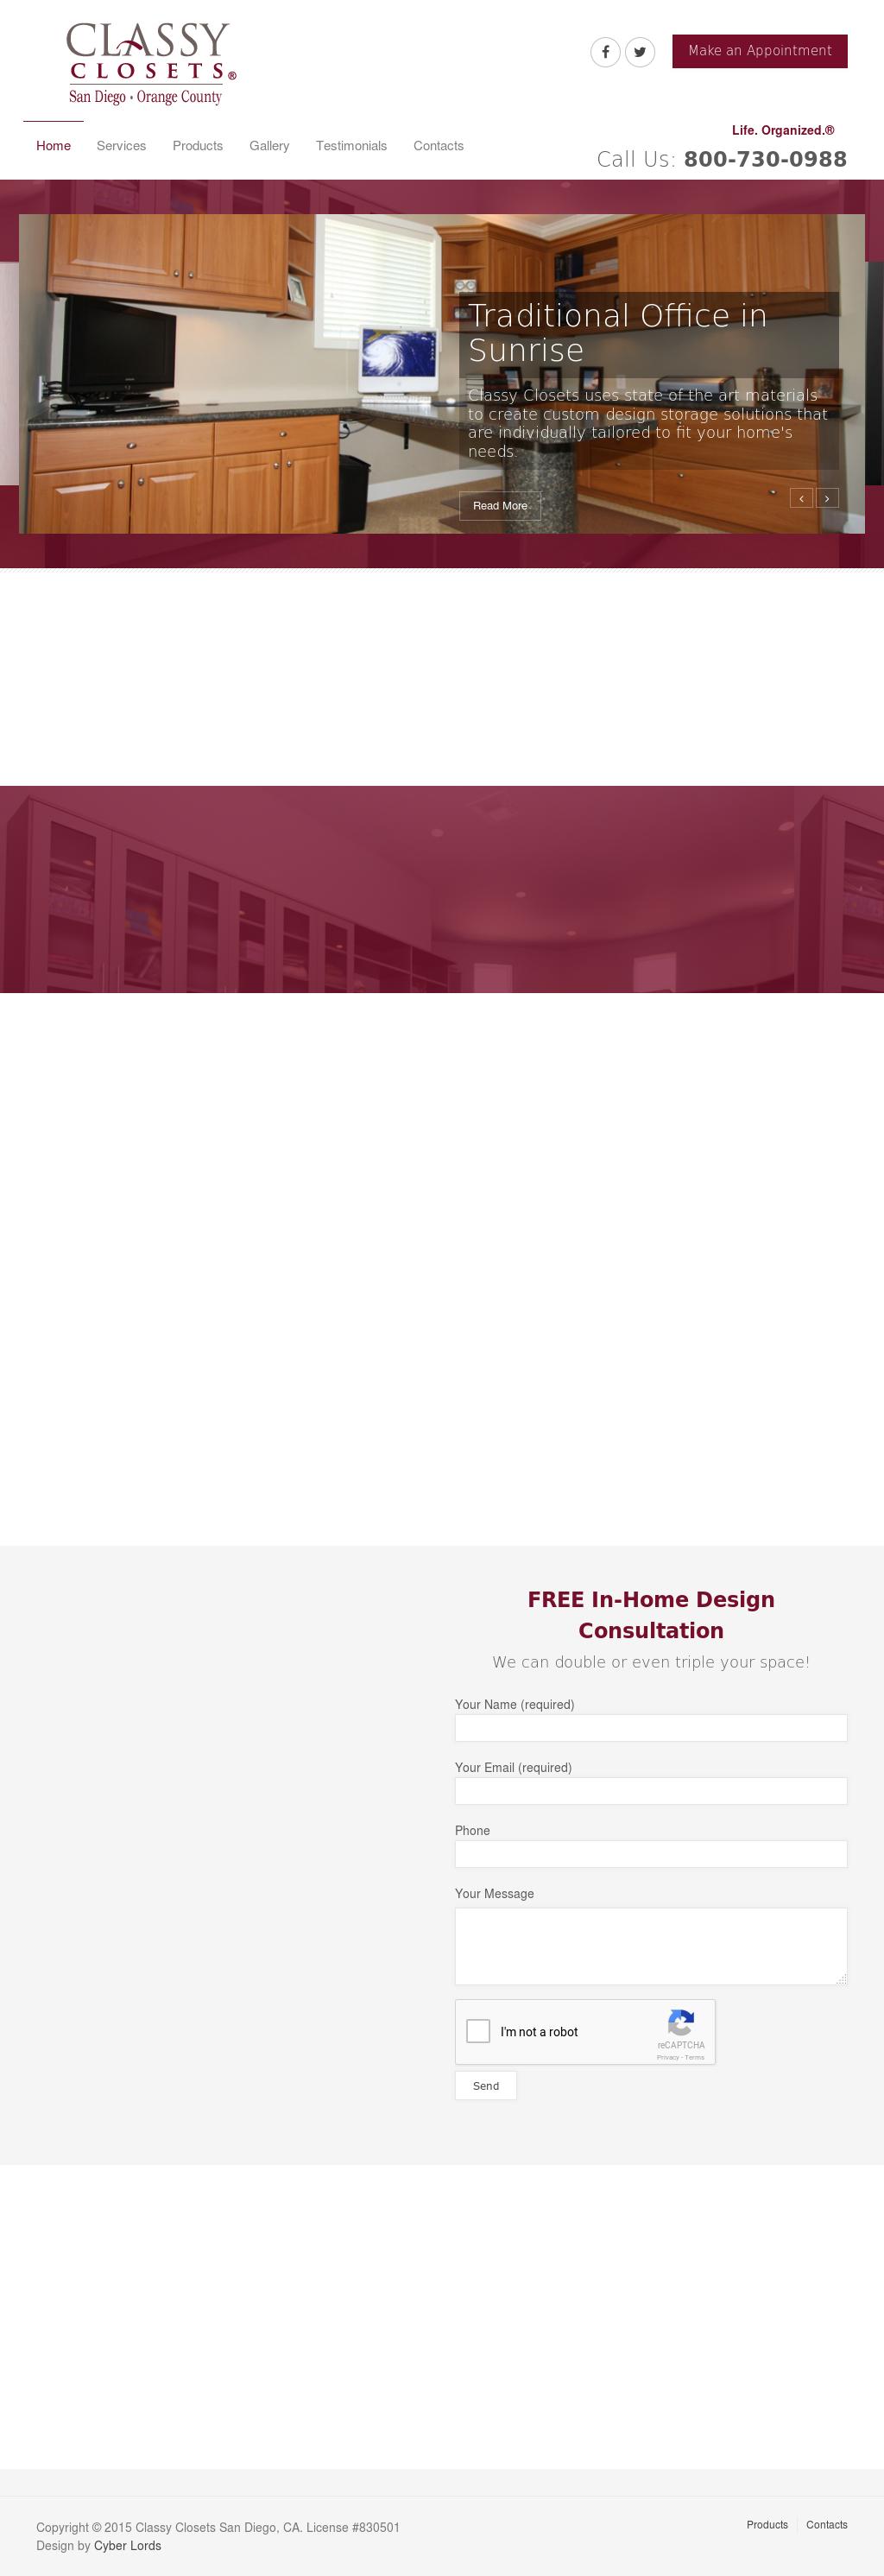 Classy Closets Etcu0027s Website Screenshot On Sep 2017